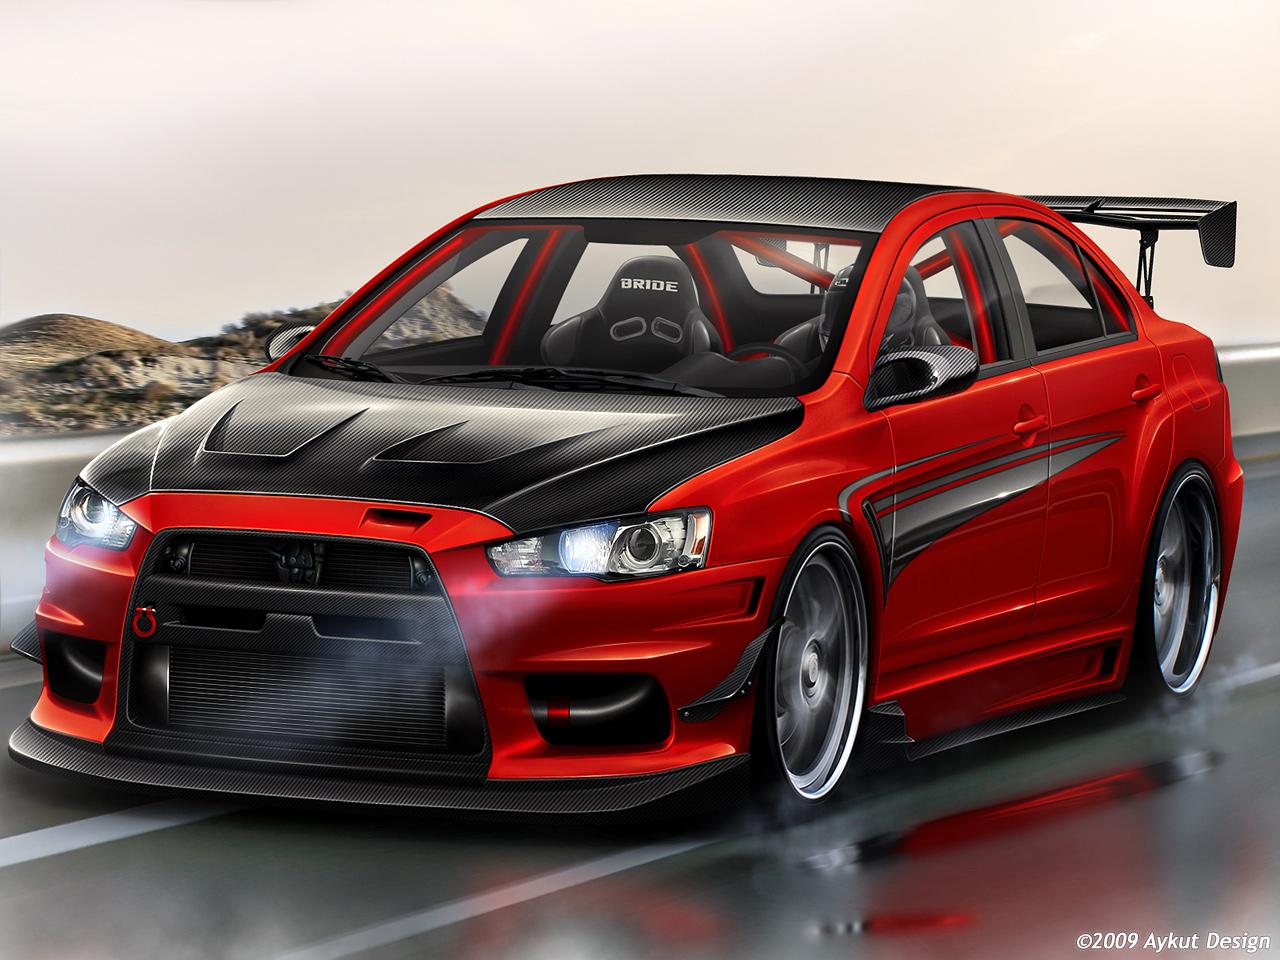 Evo X Modded >> Mitsubishi lancer evolution wallpaper |Its My Car Club